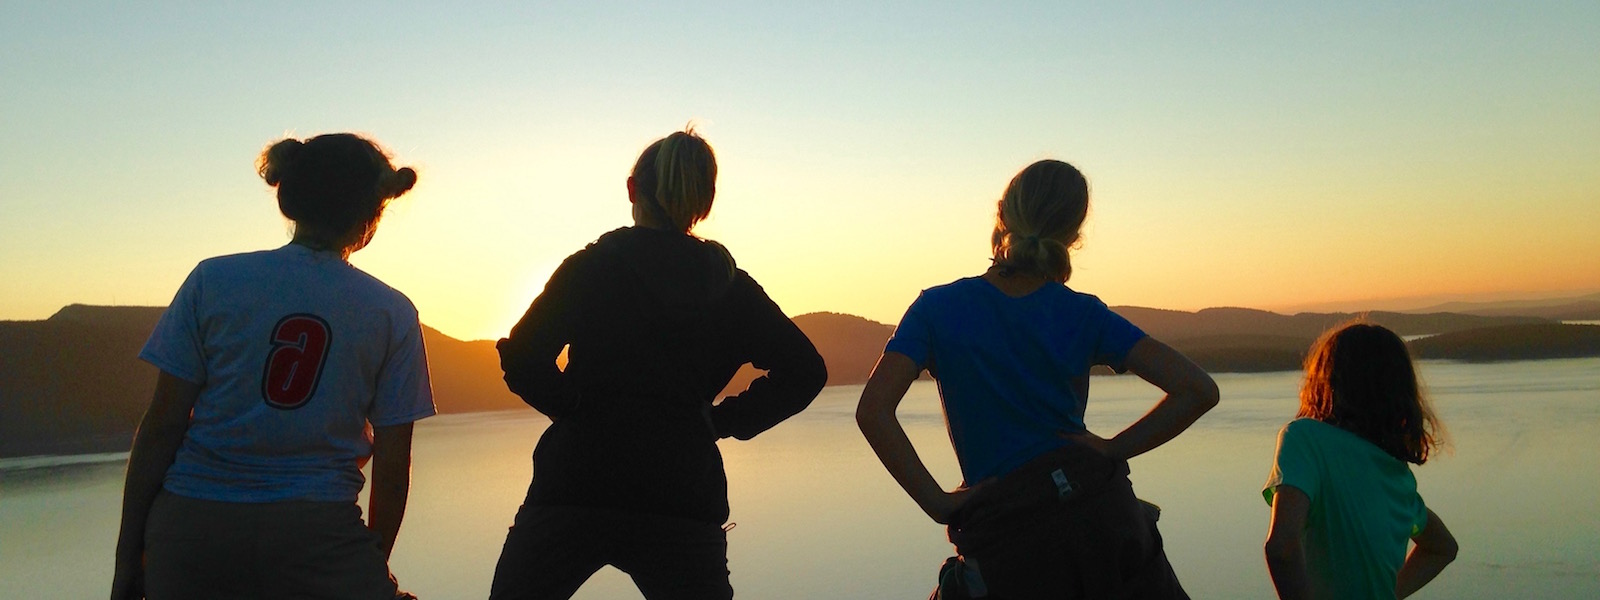 Teen Adventure Travel Camp Lifestyle